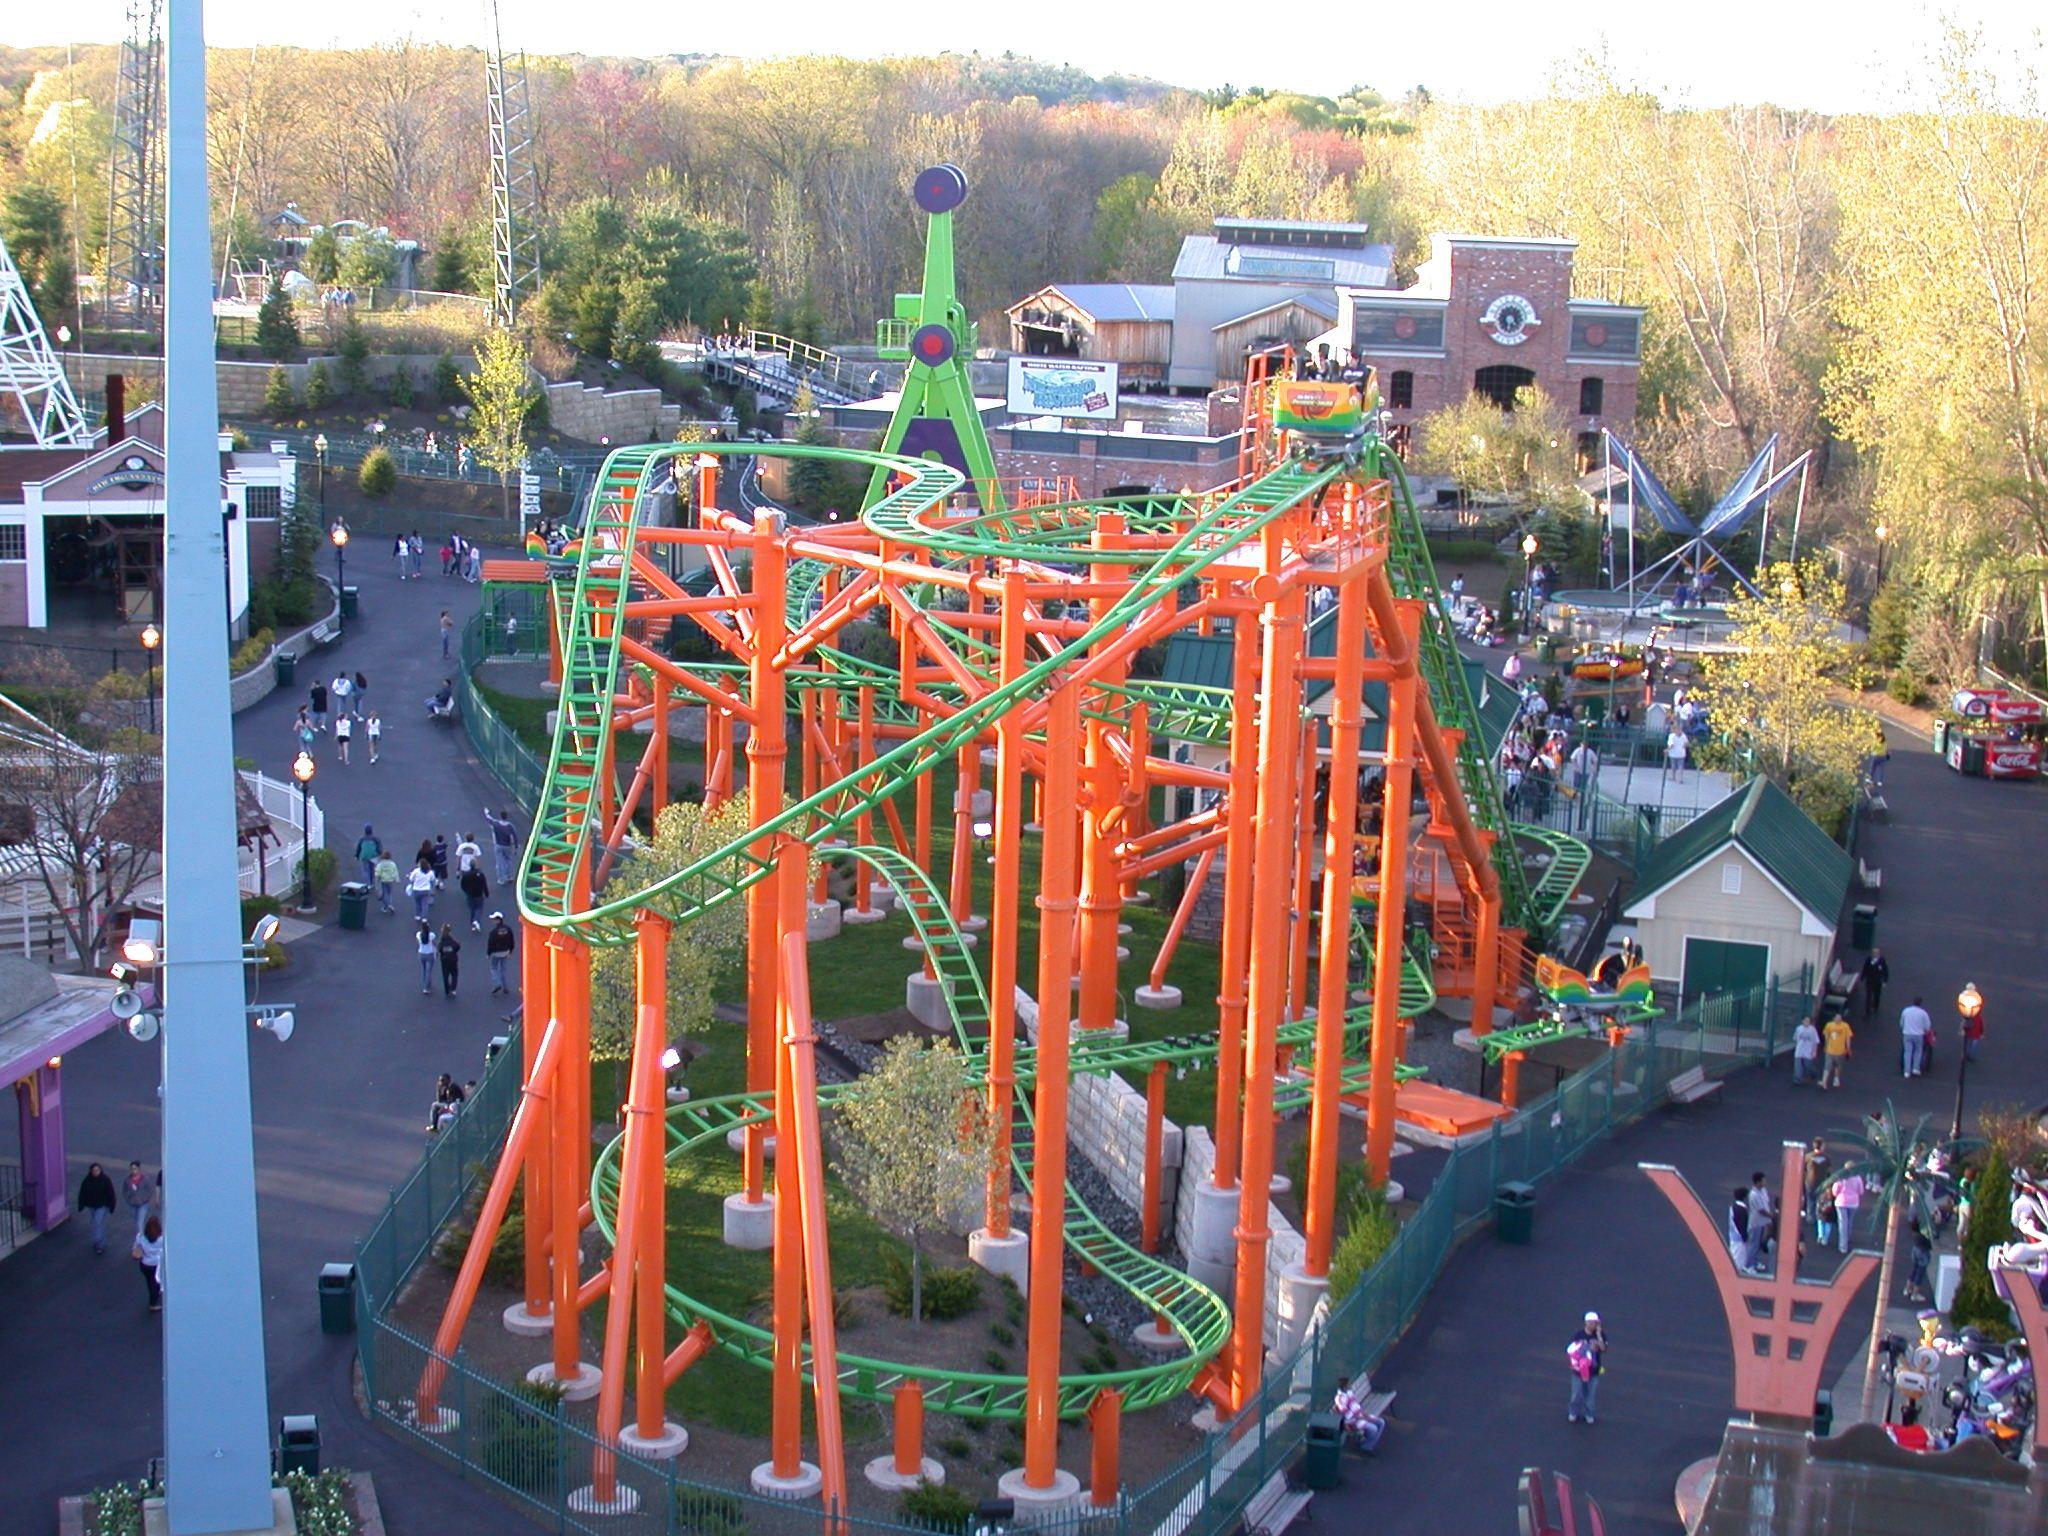 Pandemonium Roller Coaster At Six Flags New England Roller Coaster Amusement Park Theme Park